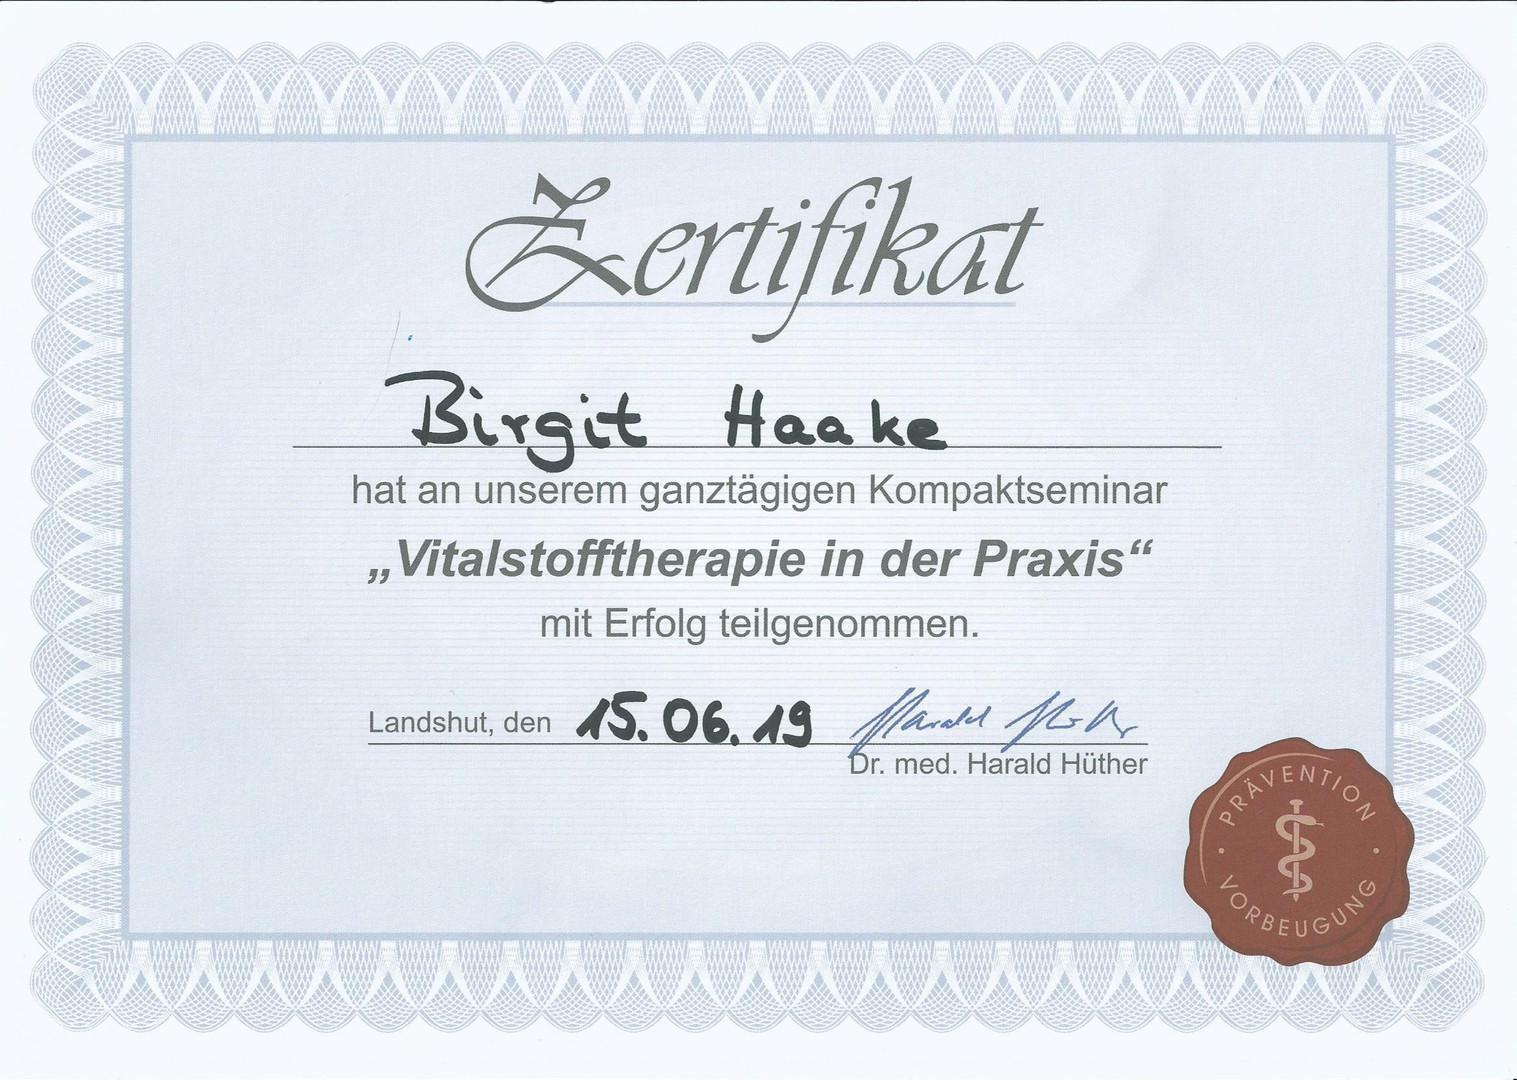 Hüther Vitalstofftherapie